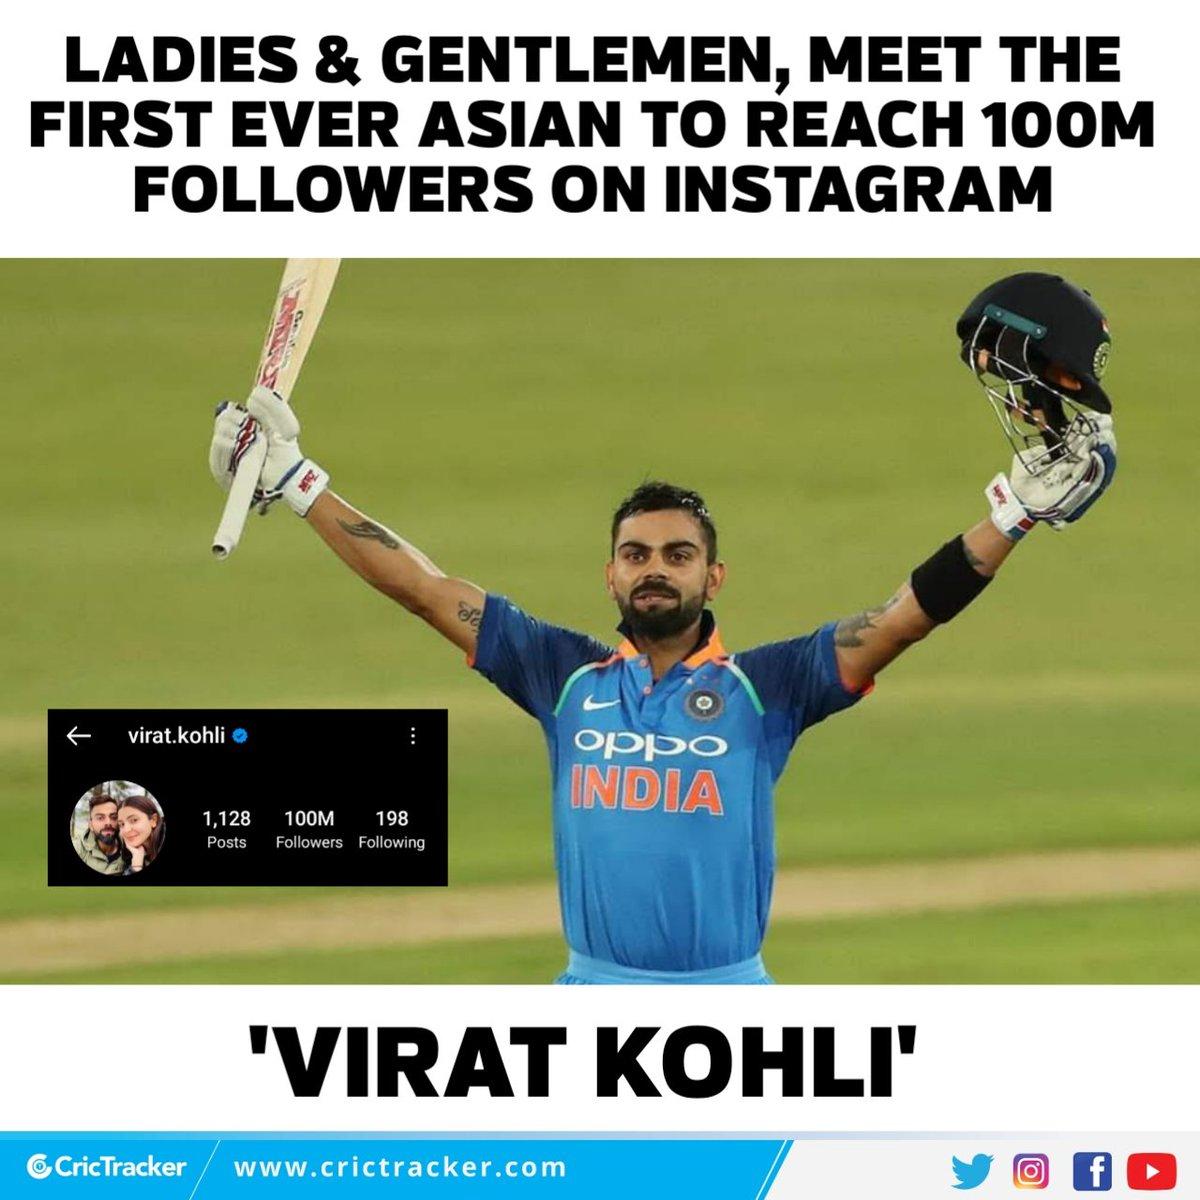 Yet another century for Virat Kohli.  #ViratKohli | #Cricket | #instagram | #CricTracker